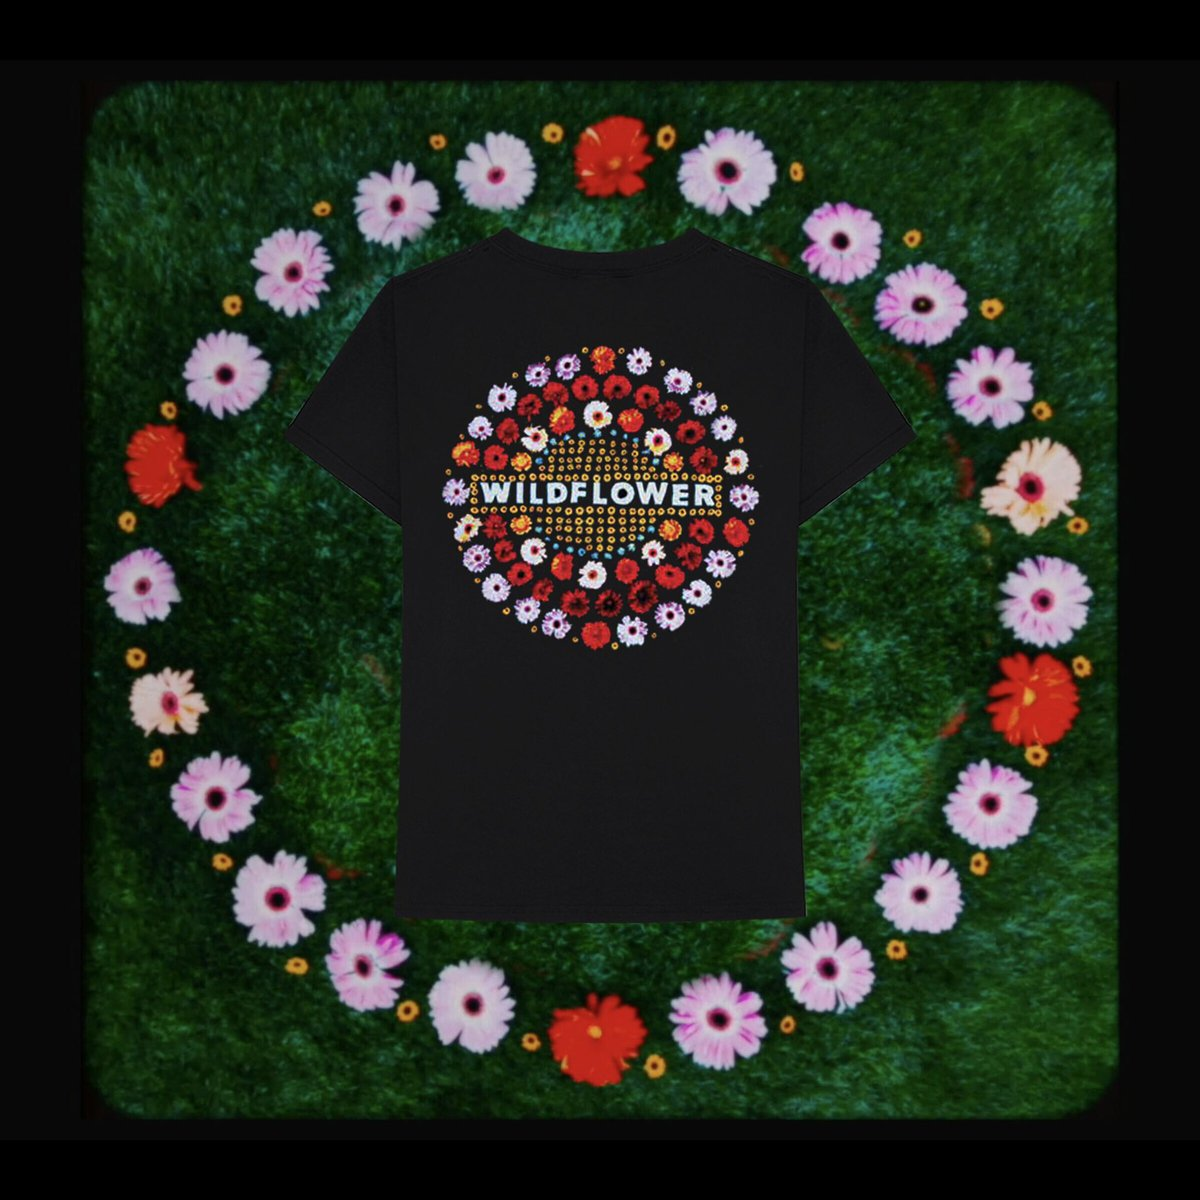 USA, Get your Wildflower/CALM merch now: 5secondsofsummershop.com